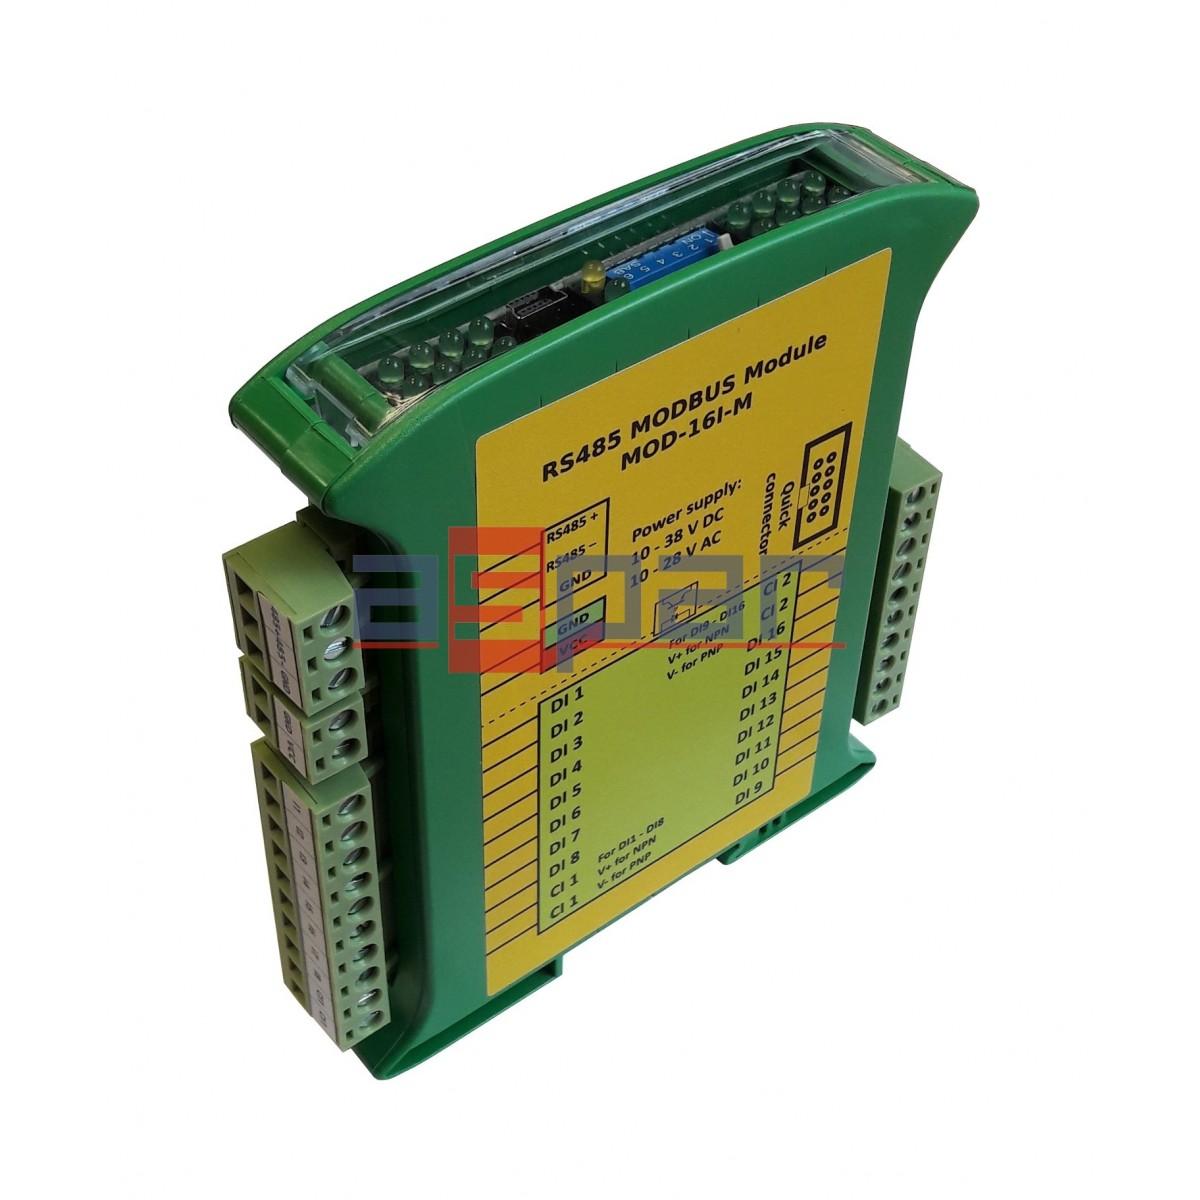 16 digital inputs with memory, MOD-16I-M